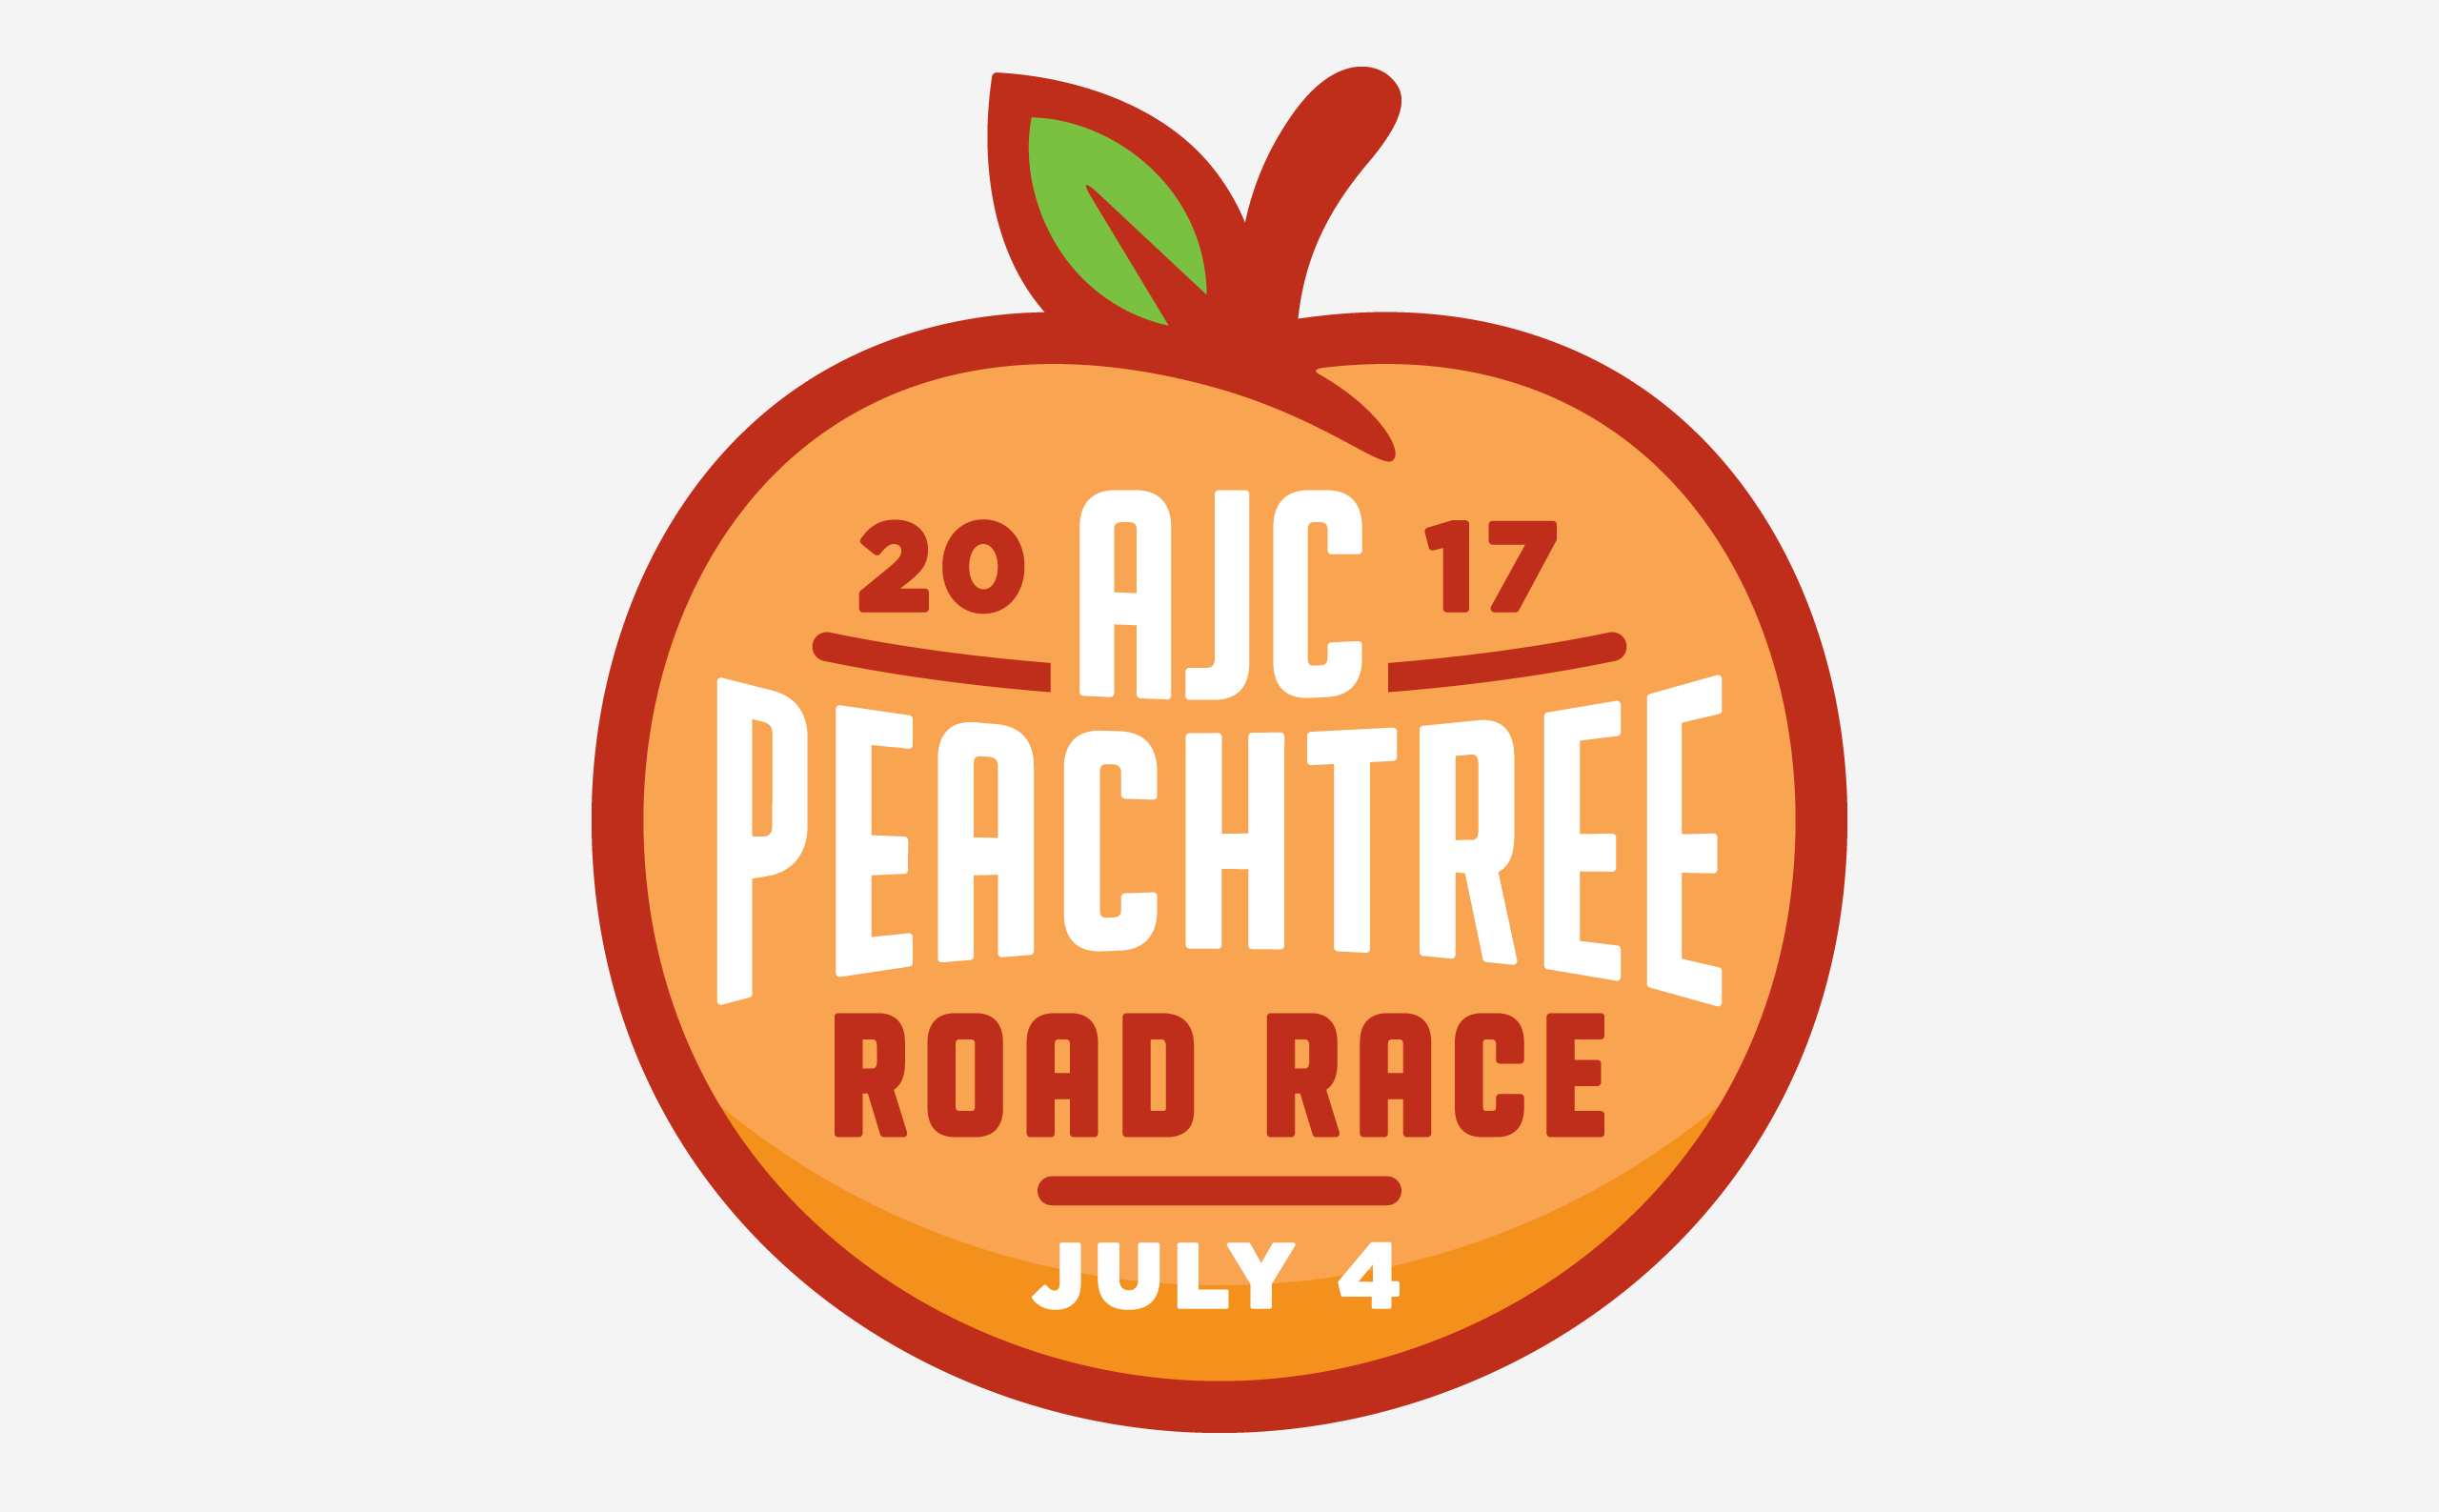 Peachtree Road Race Shirt Design – Mullinax Co